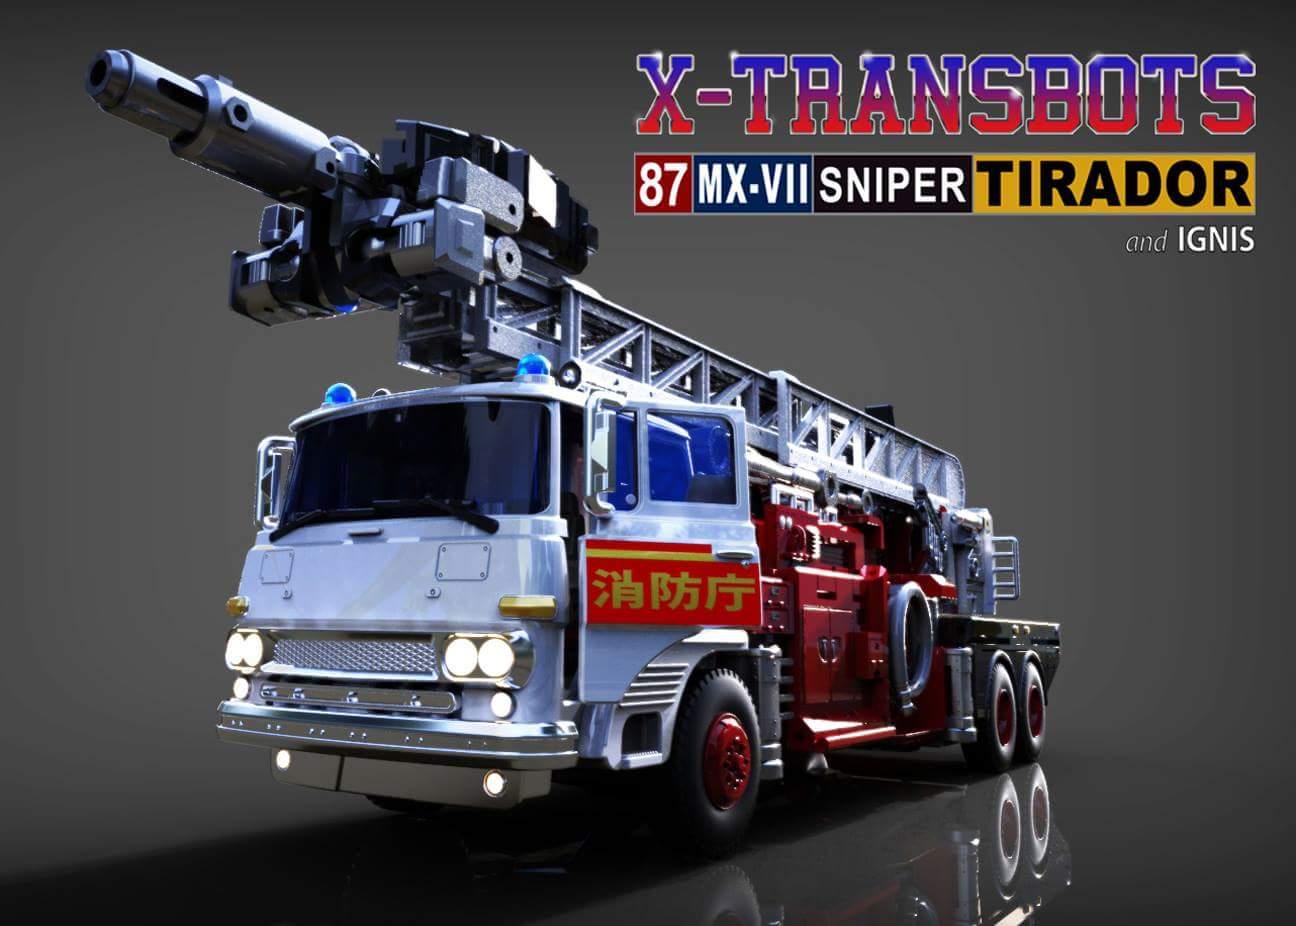 [X-Transbots] Produit Tiers - MX-V Dante (aka Inferno) + MX-VII Tirador & Ignis (aka Artfire & Nightstick) 7cey0ICW